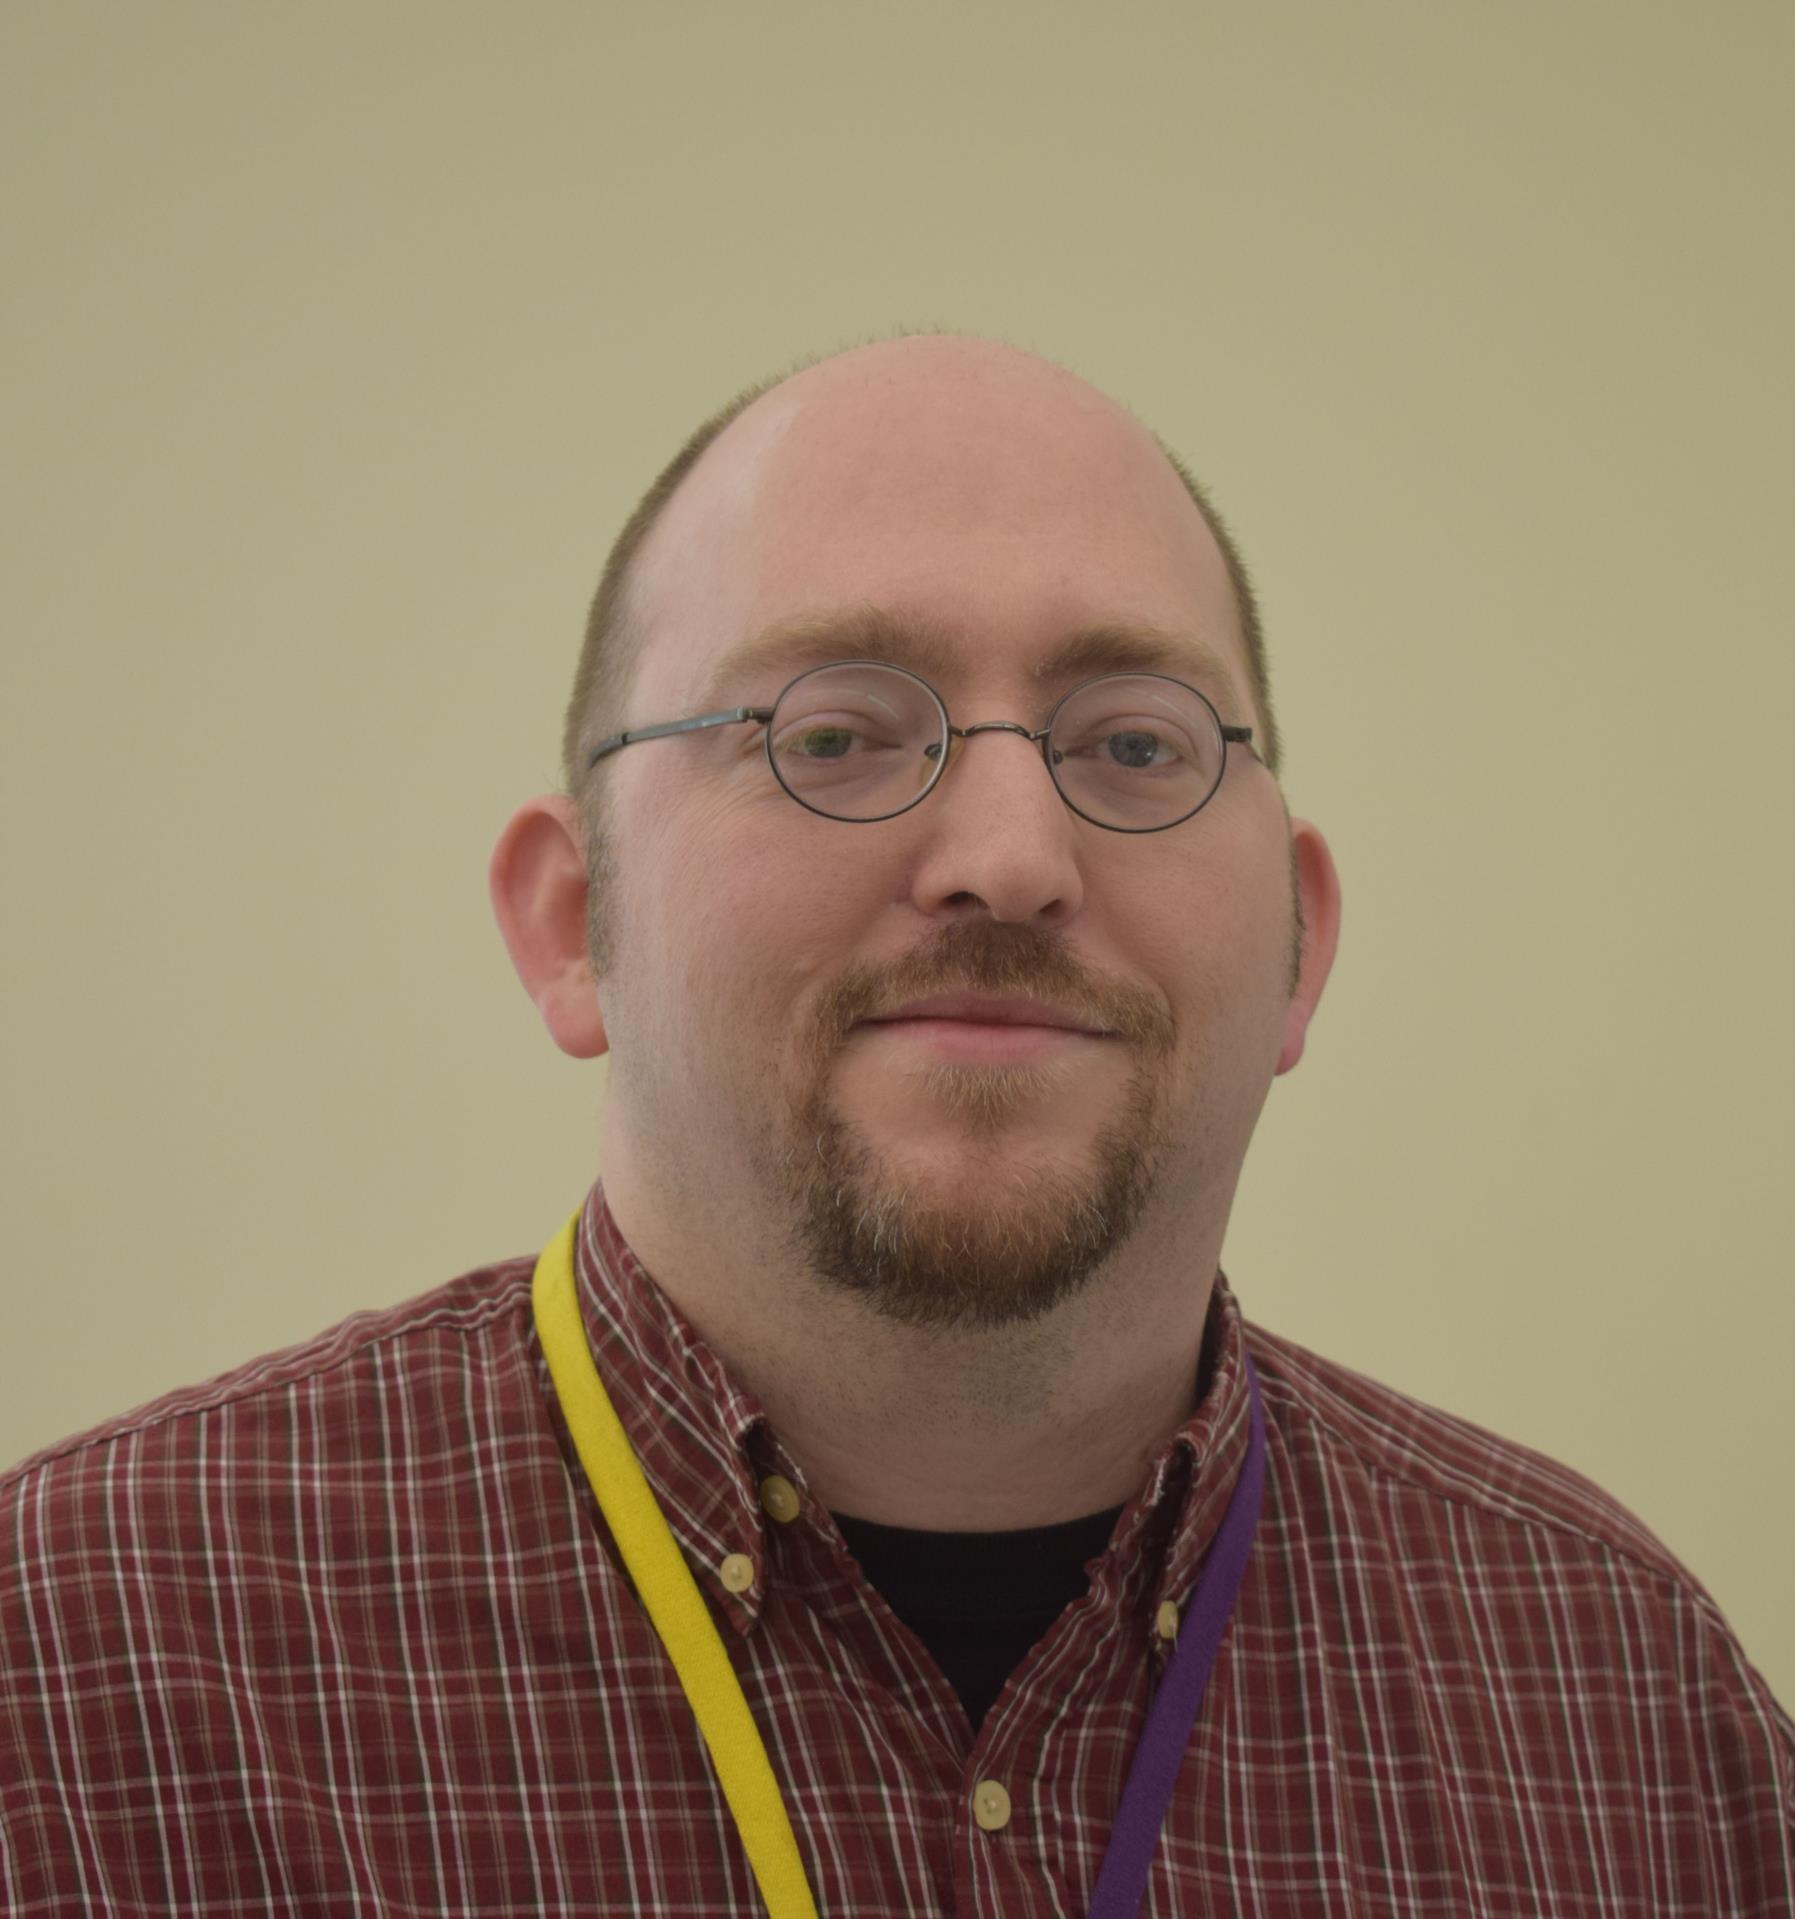 A photo of william rexroat